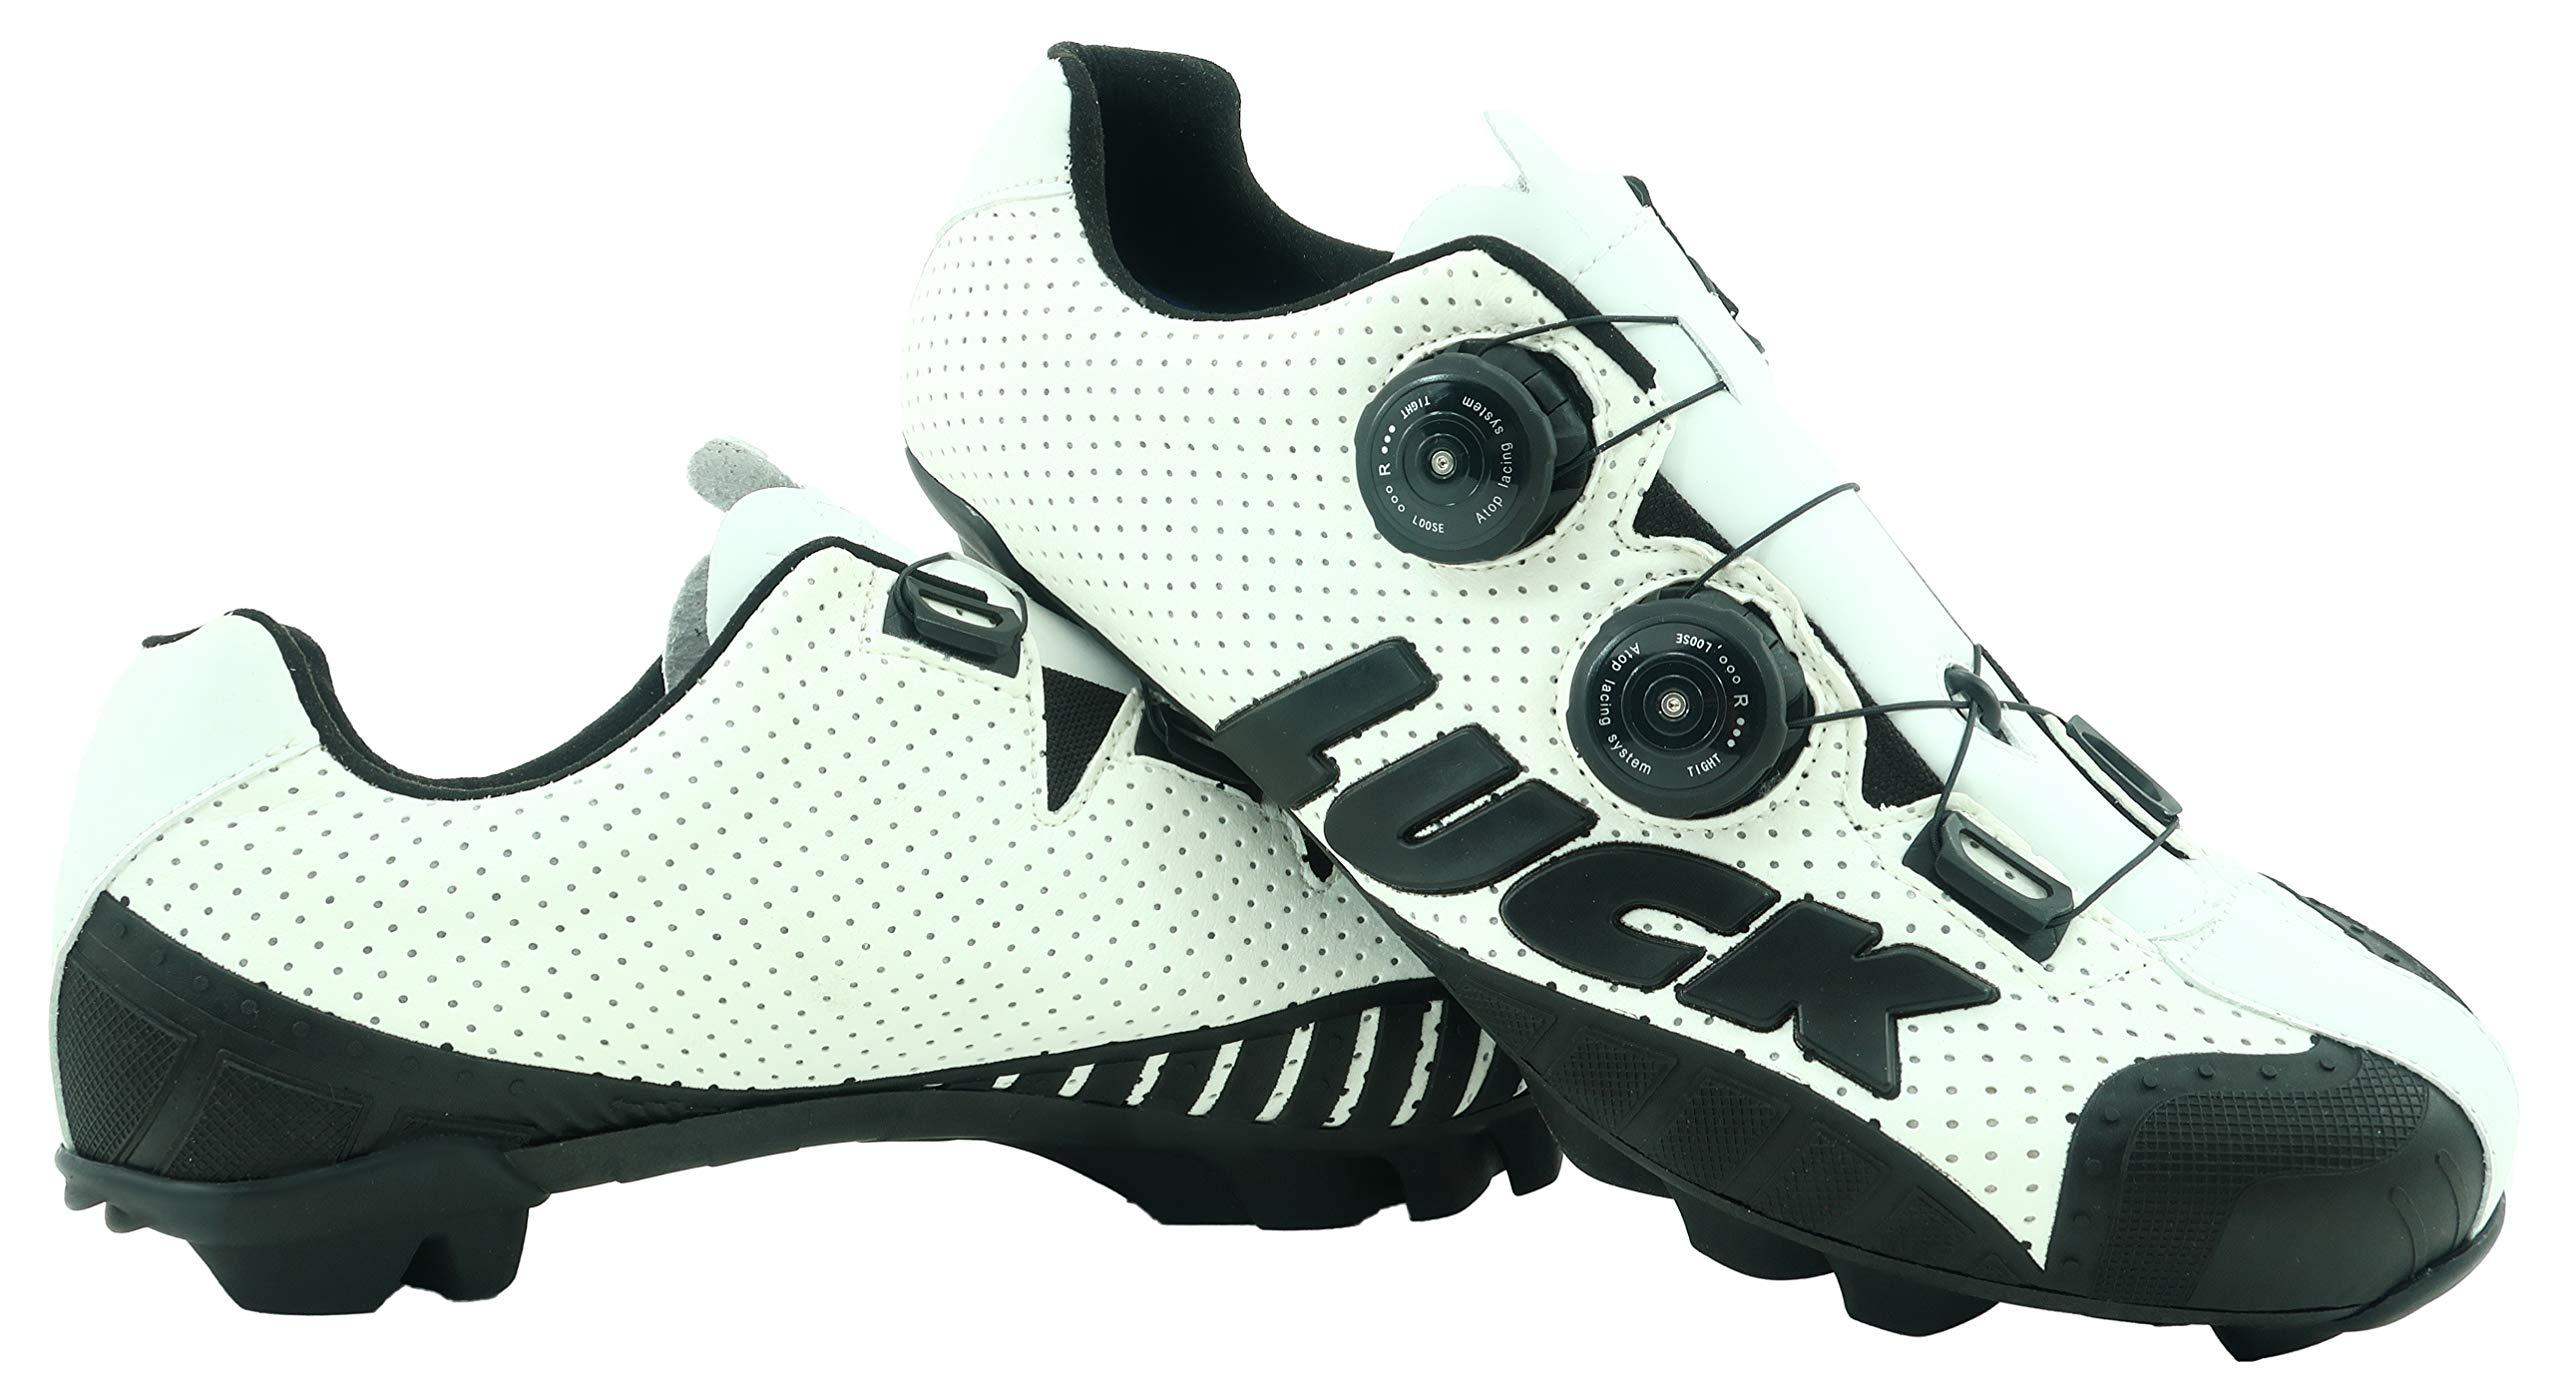 LUCK Zapatillas de Ciclismo MTB, Excalibur, Serie Profesional, Suela de Carbono, Taco